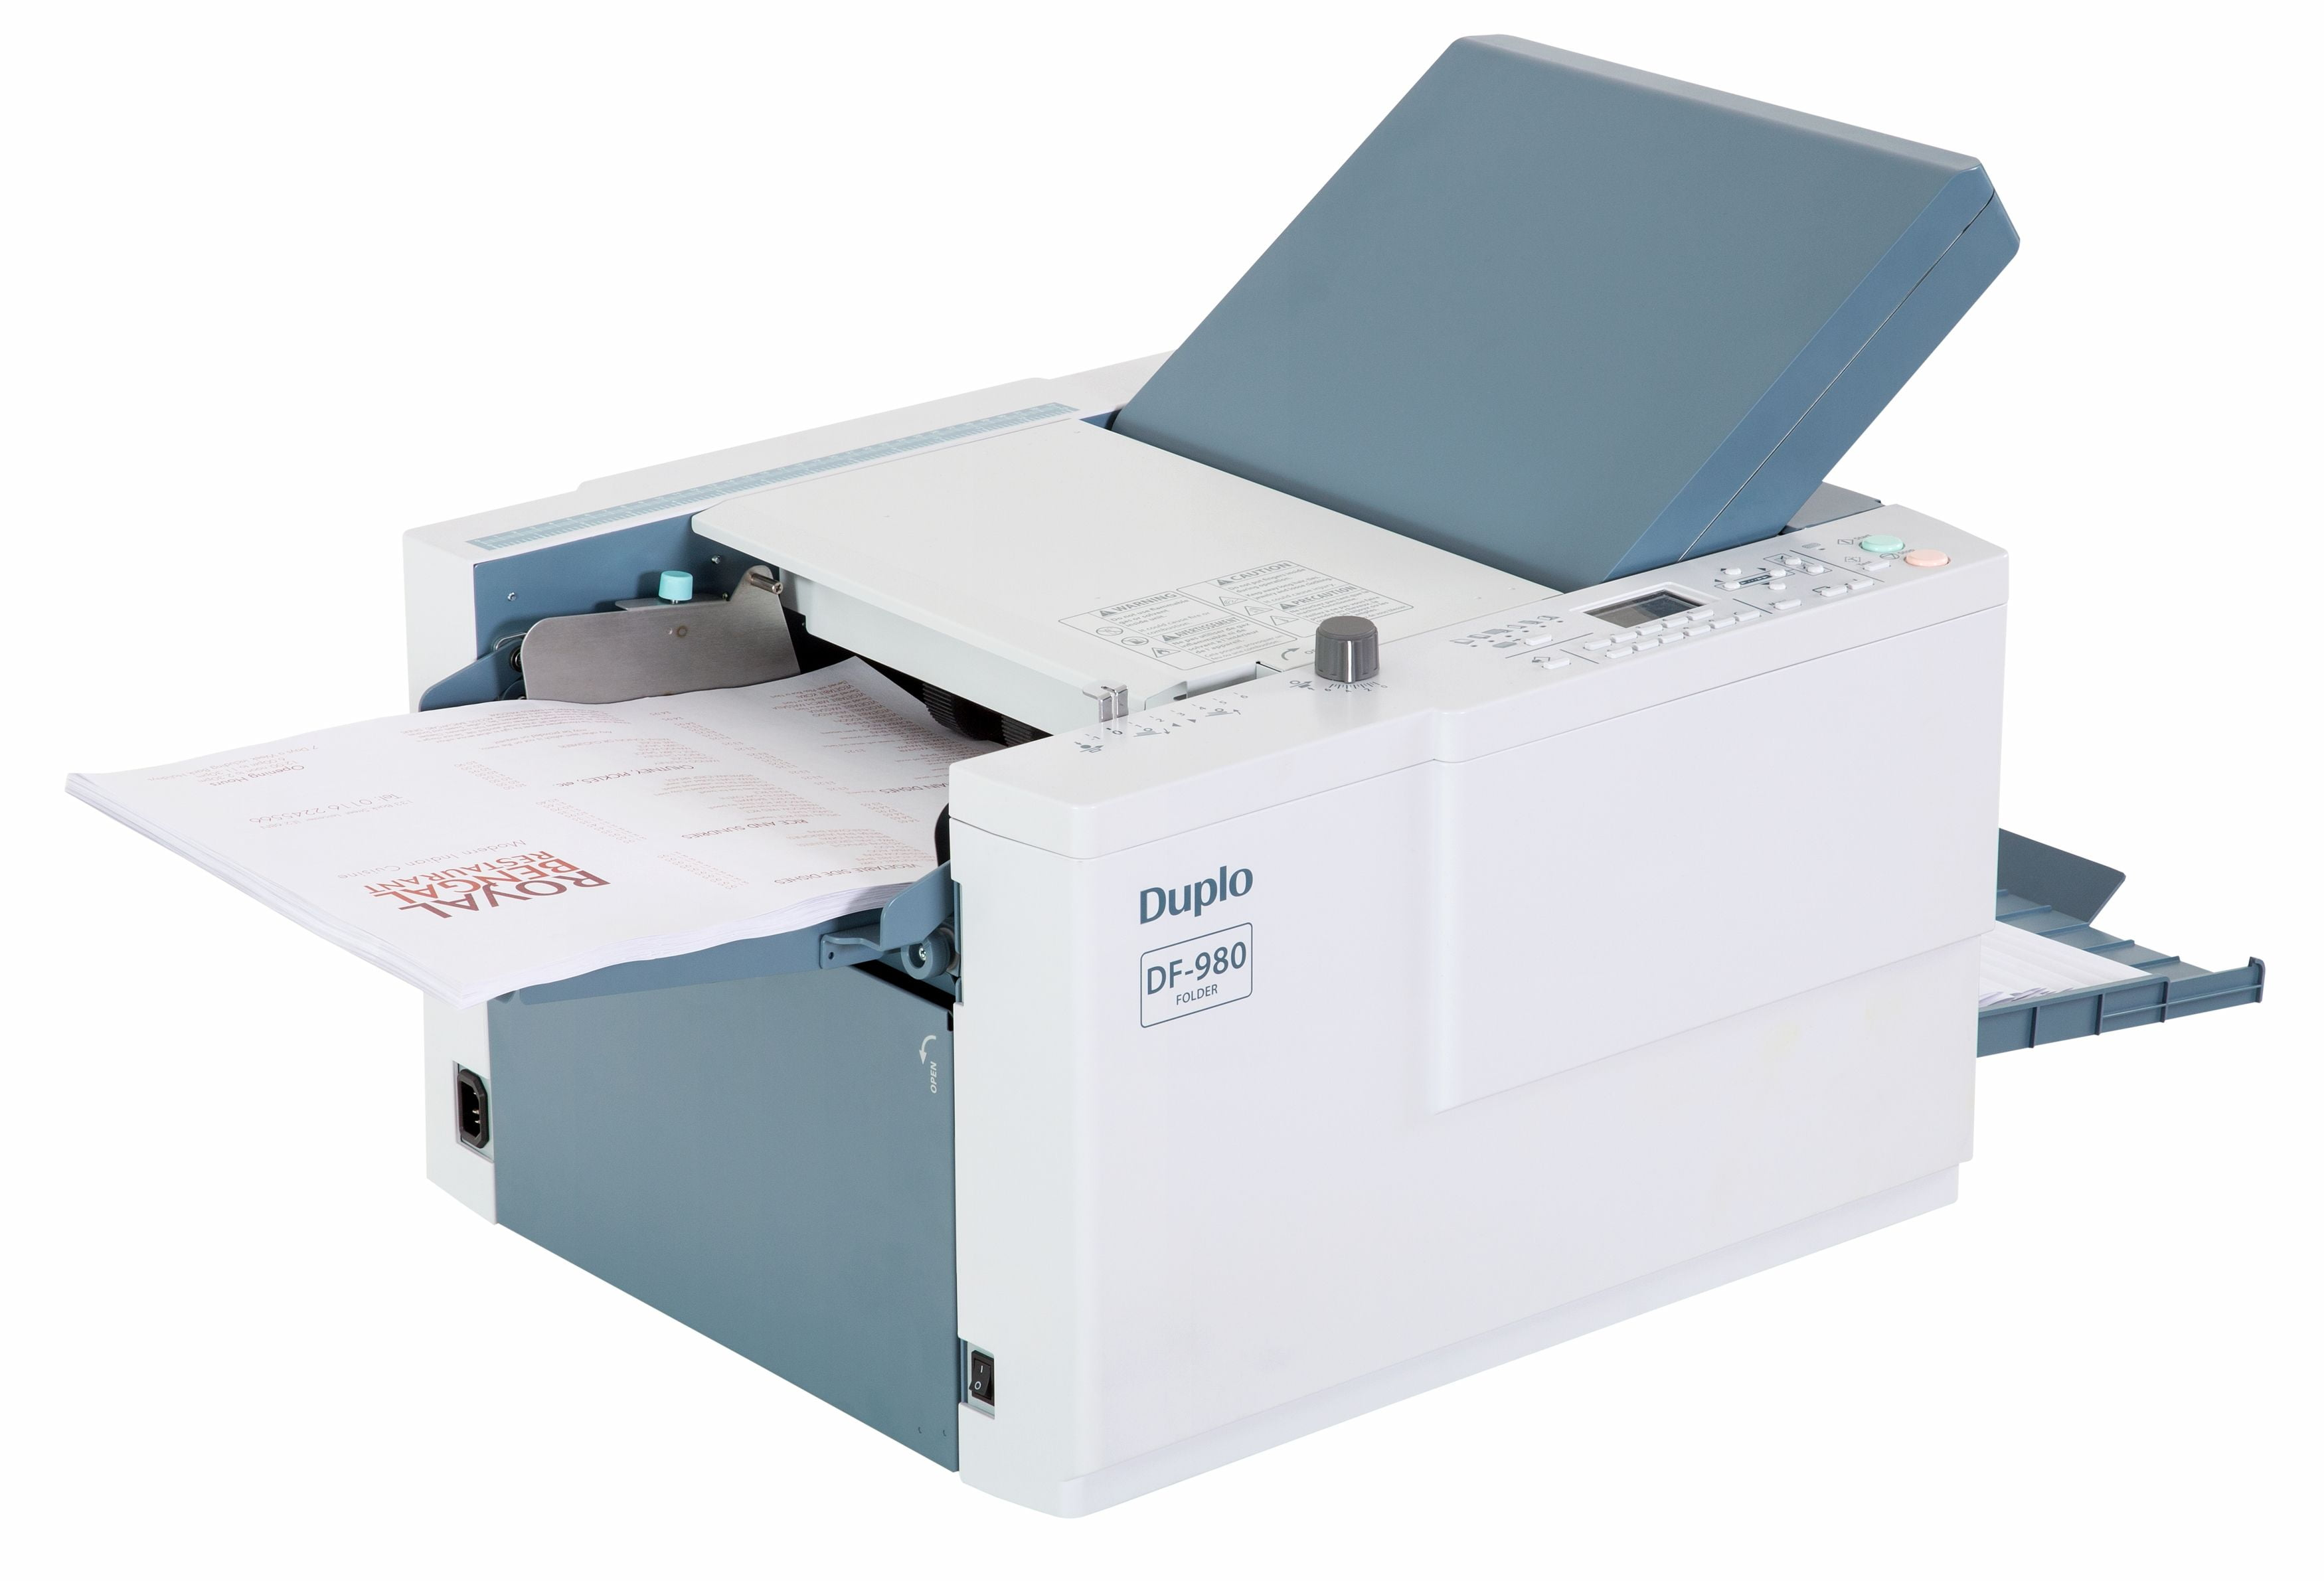 Duplo DF-980 paperfolder